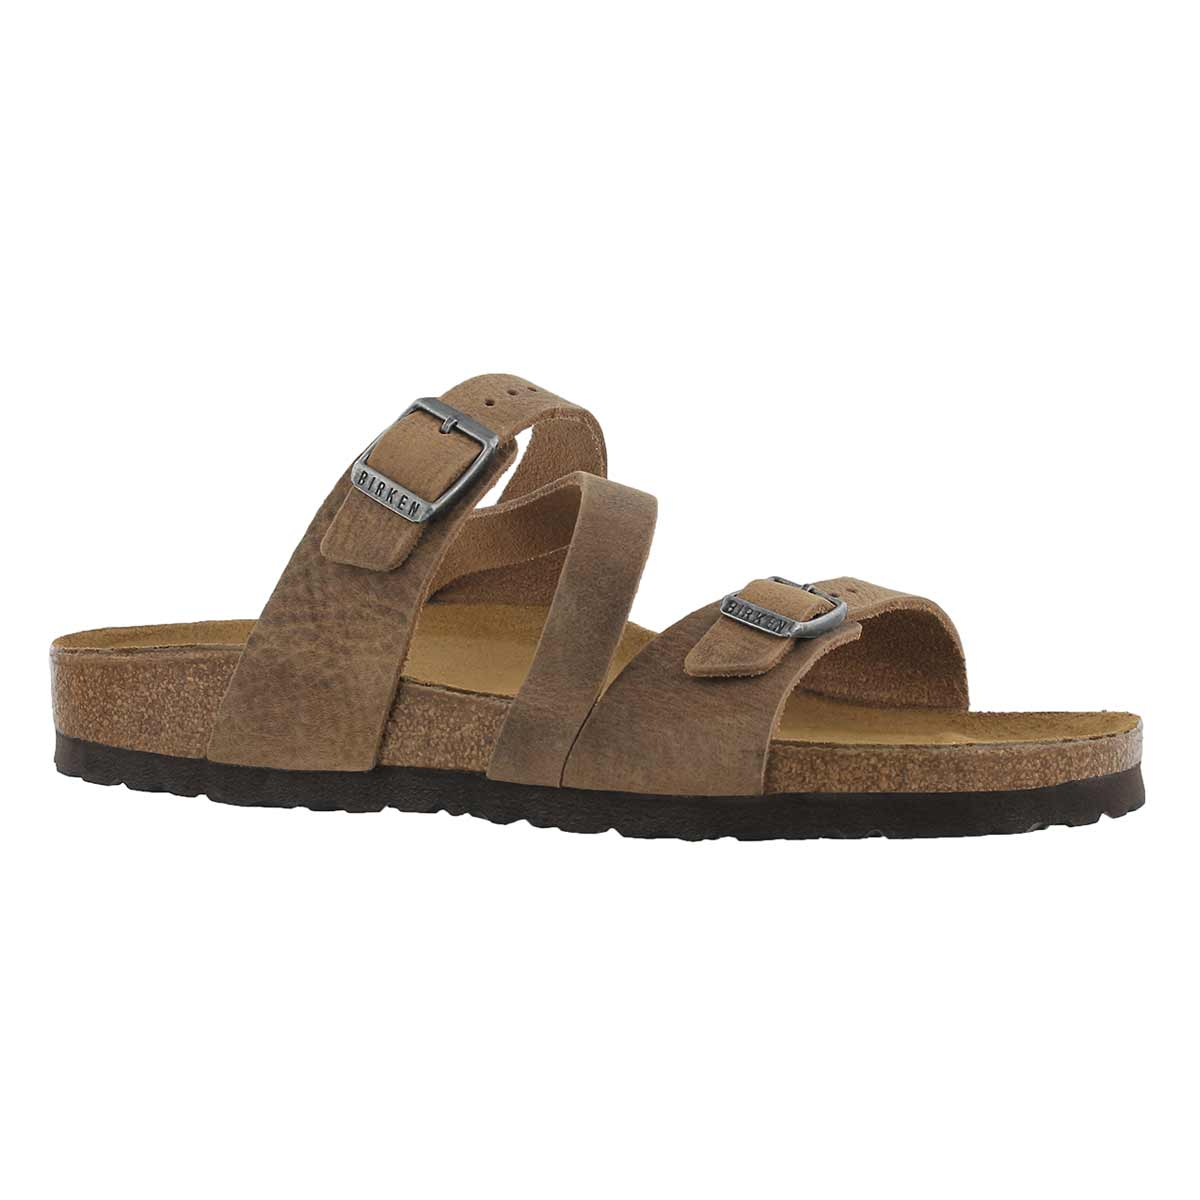 Women's SALINA CANBERRA tobacco sandals - Narrow